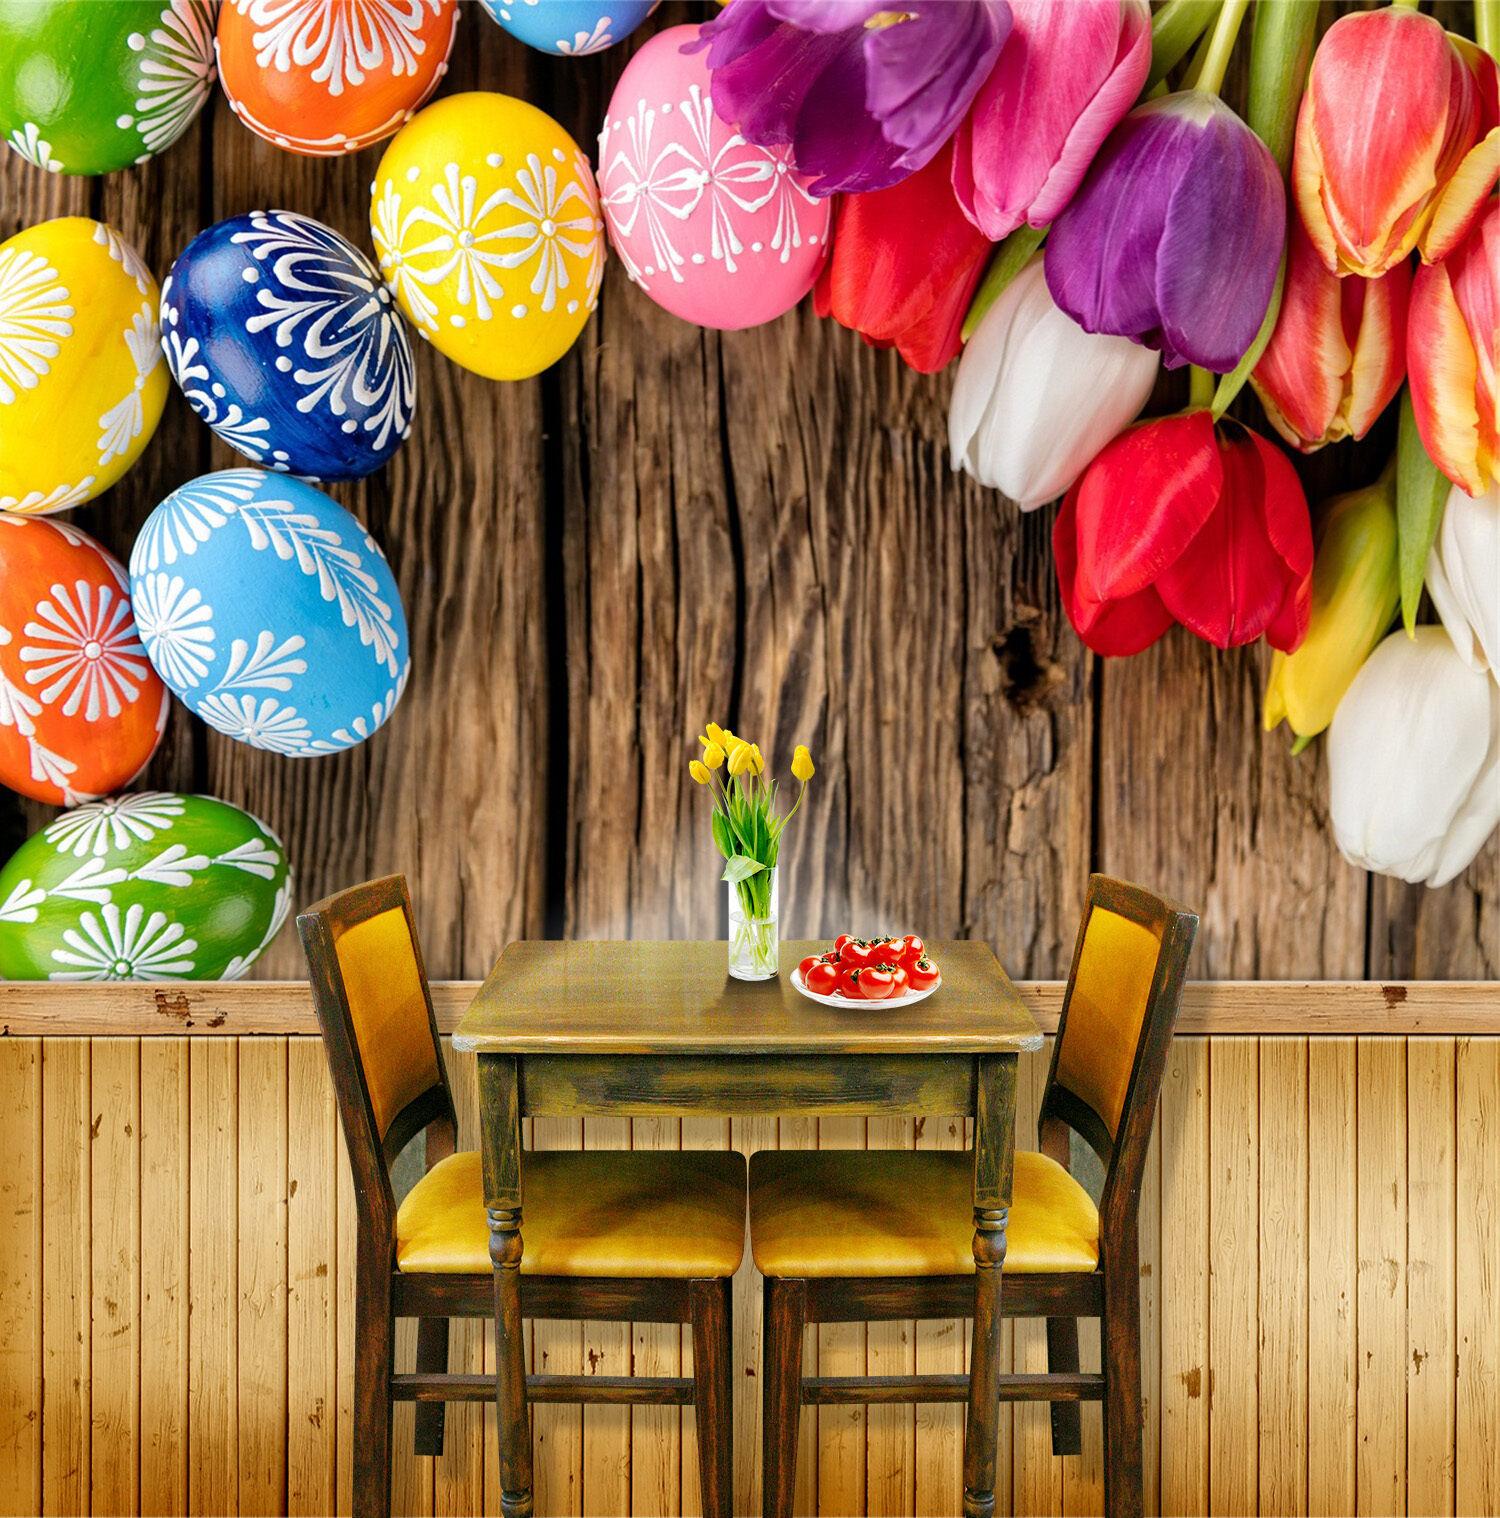 3D Flowers And Balloons 3268 Wallpaper Decal Dercor Home Kids Nursery Mural Home